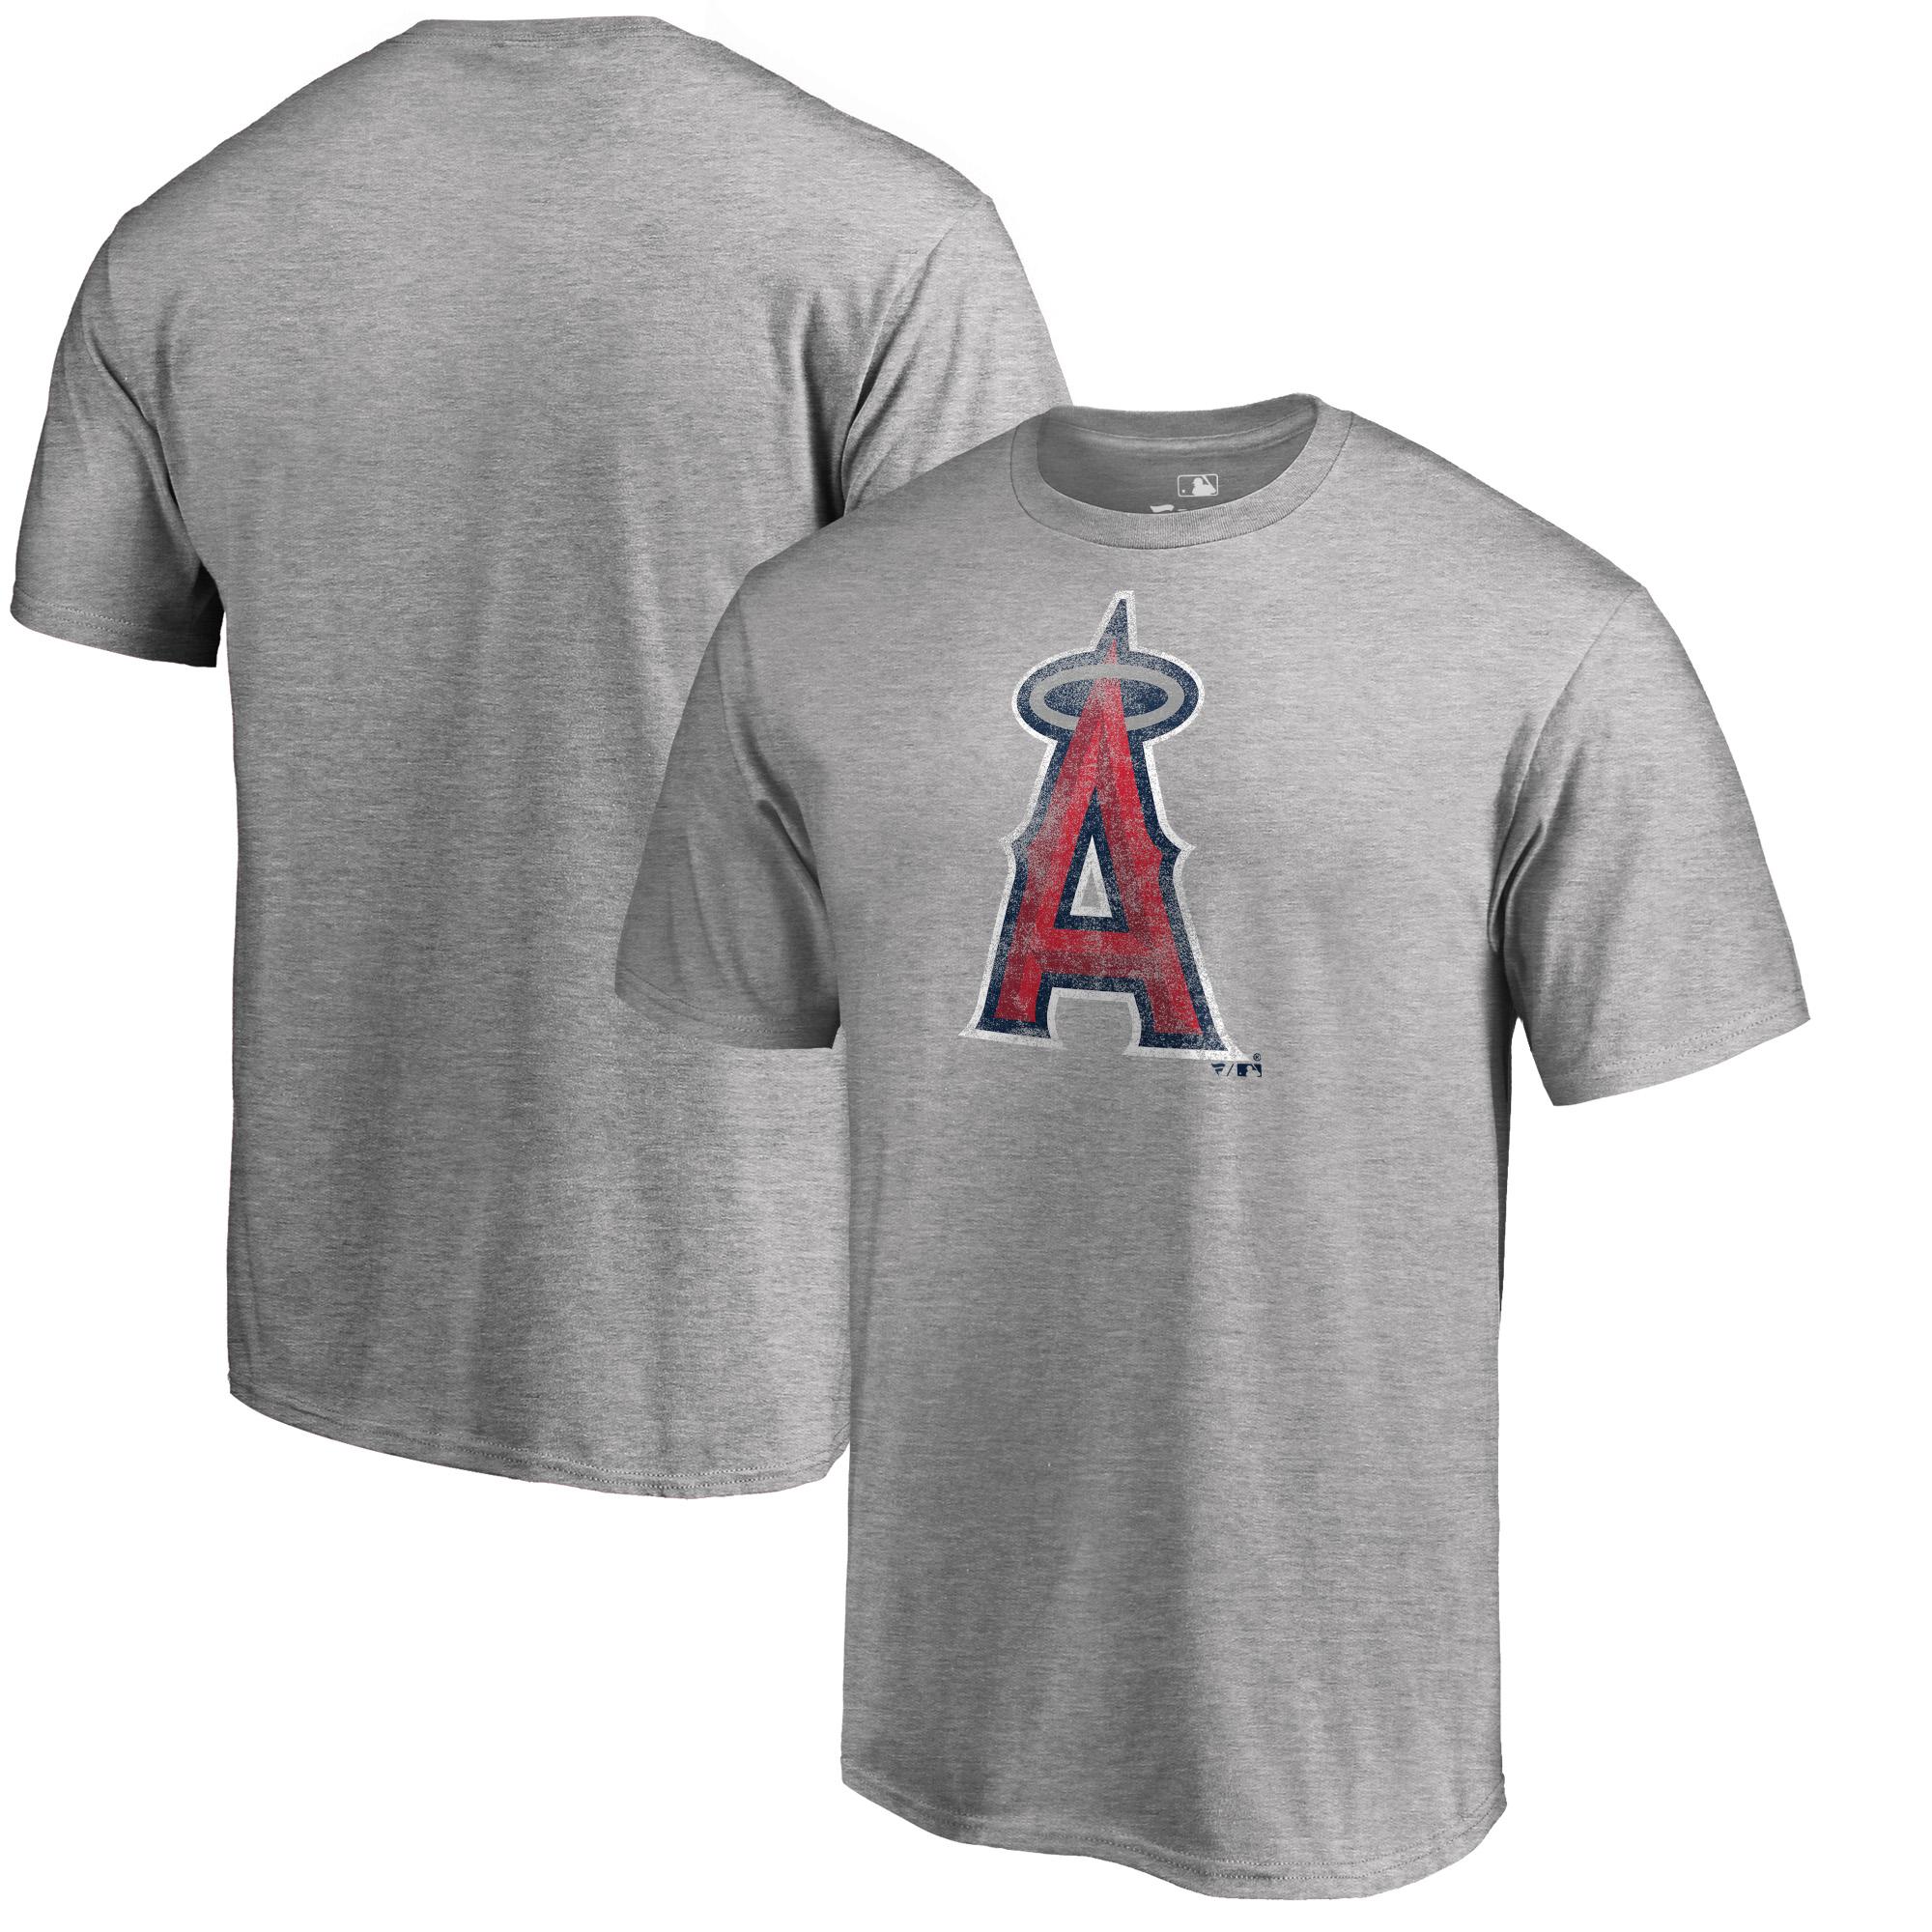 Los Angeles Angels Fanatics Branded Big & Tall Distressed Team T-Shirt - Heathered Gray